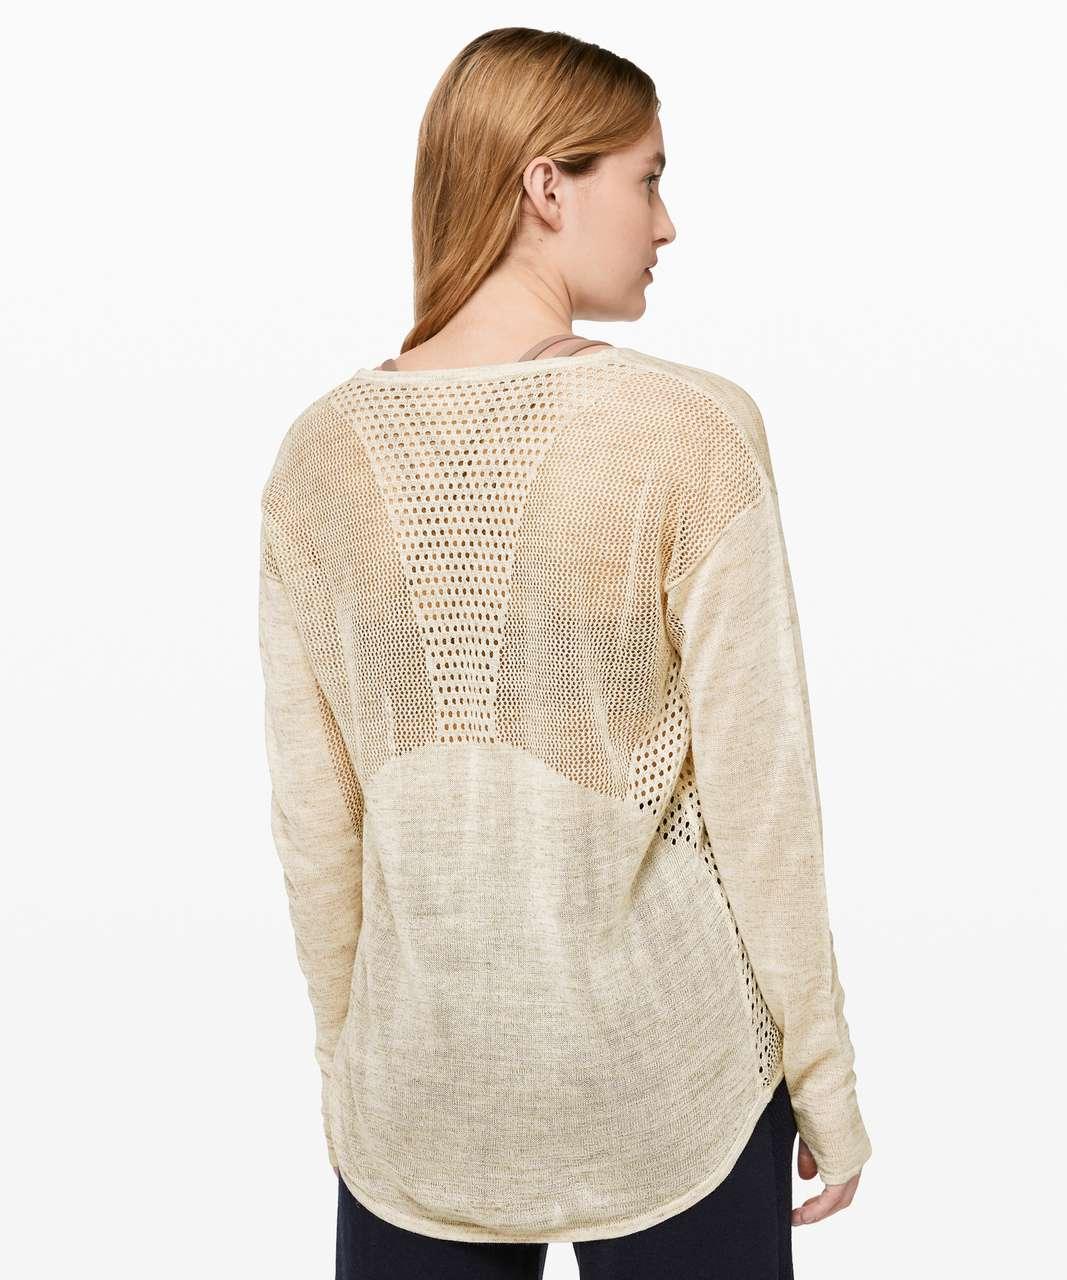 Lululemon Still Movement Sweater *Linen - Heathered Muslin